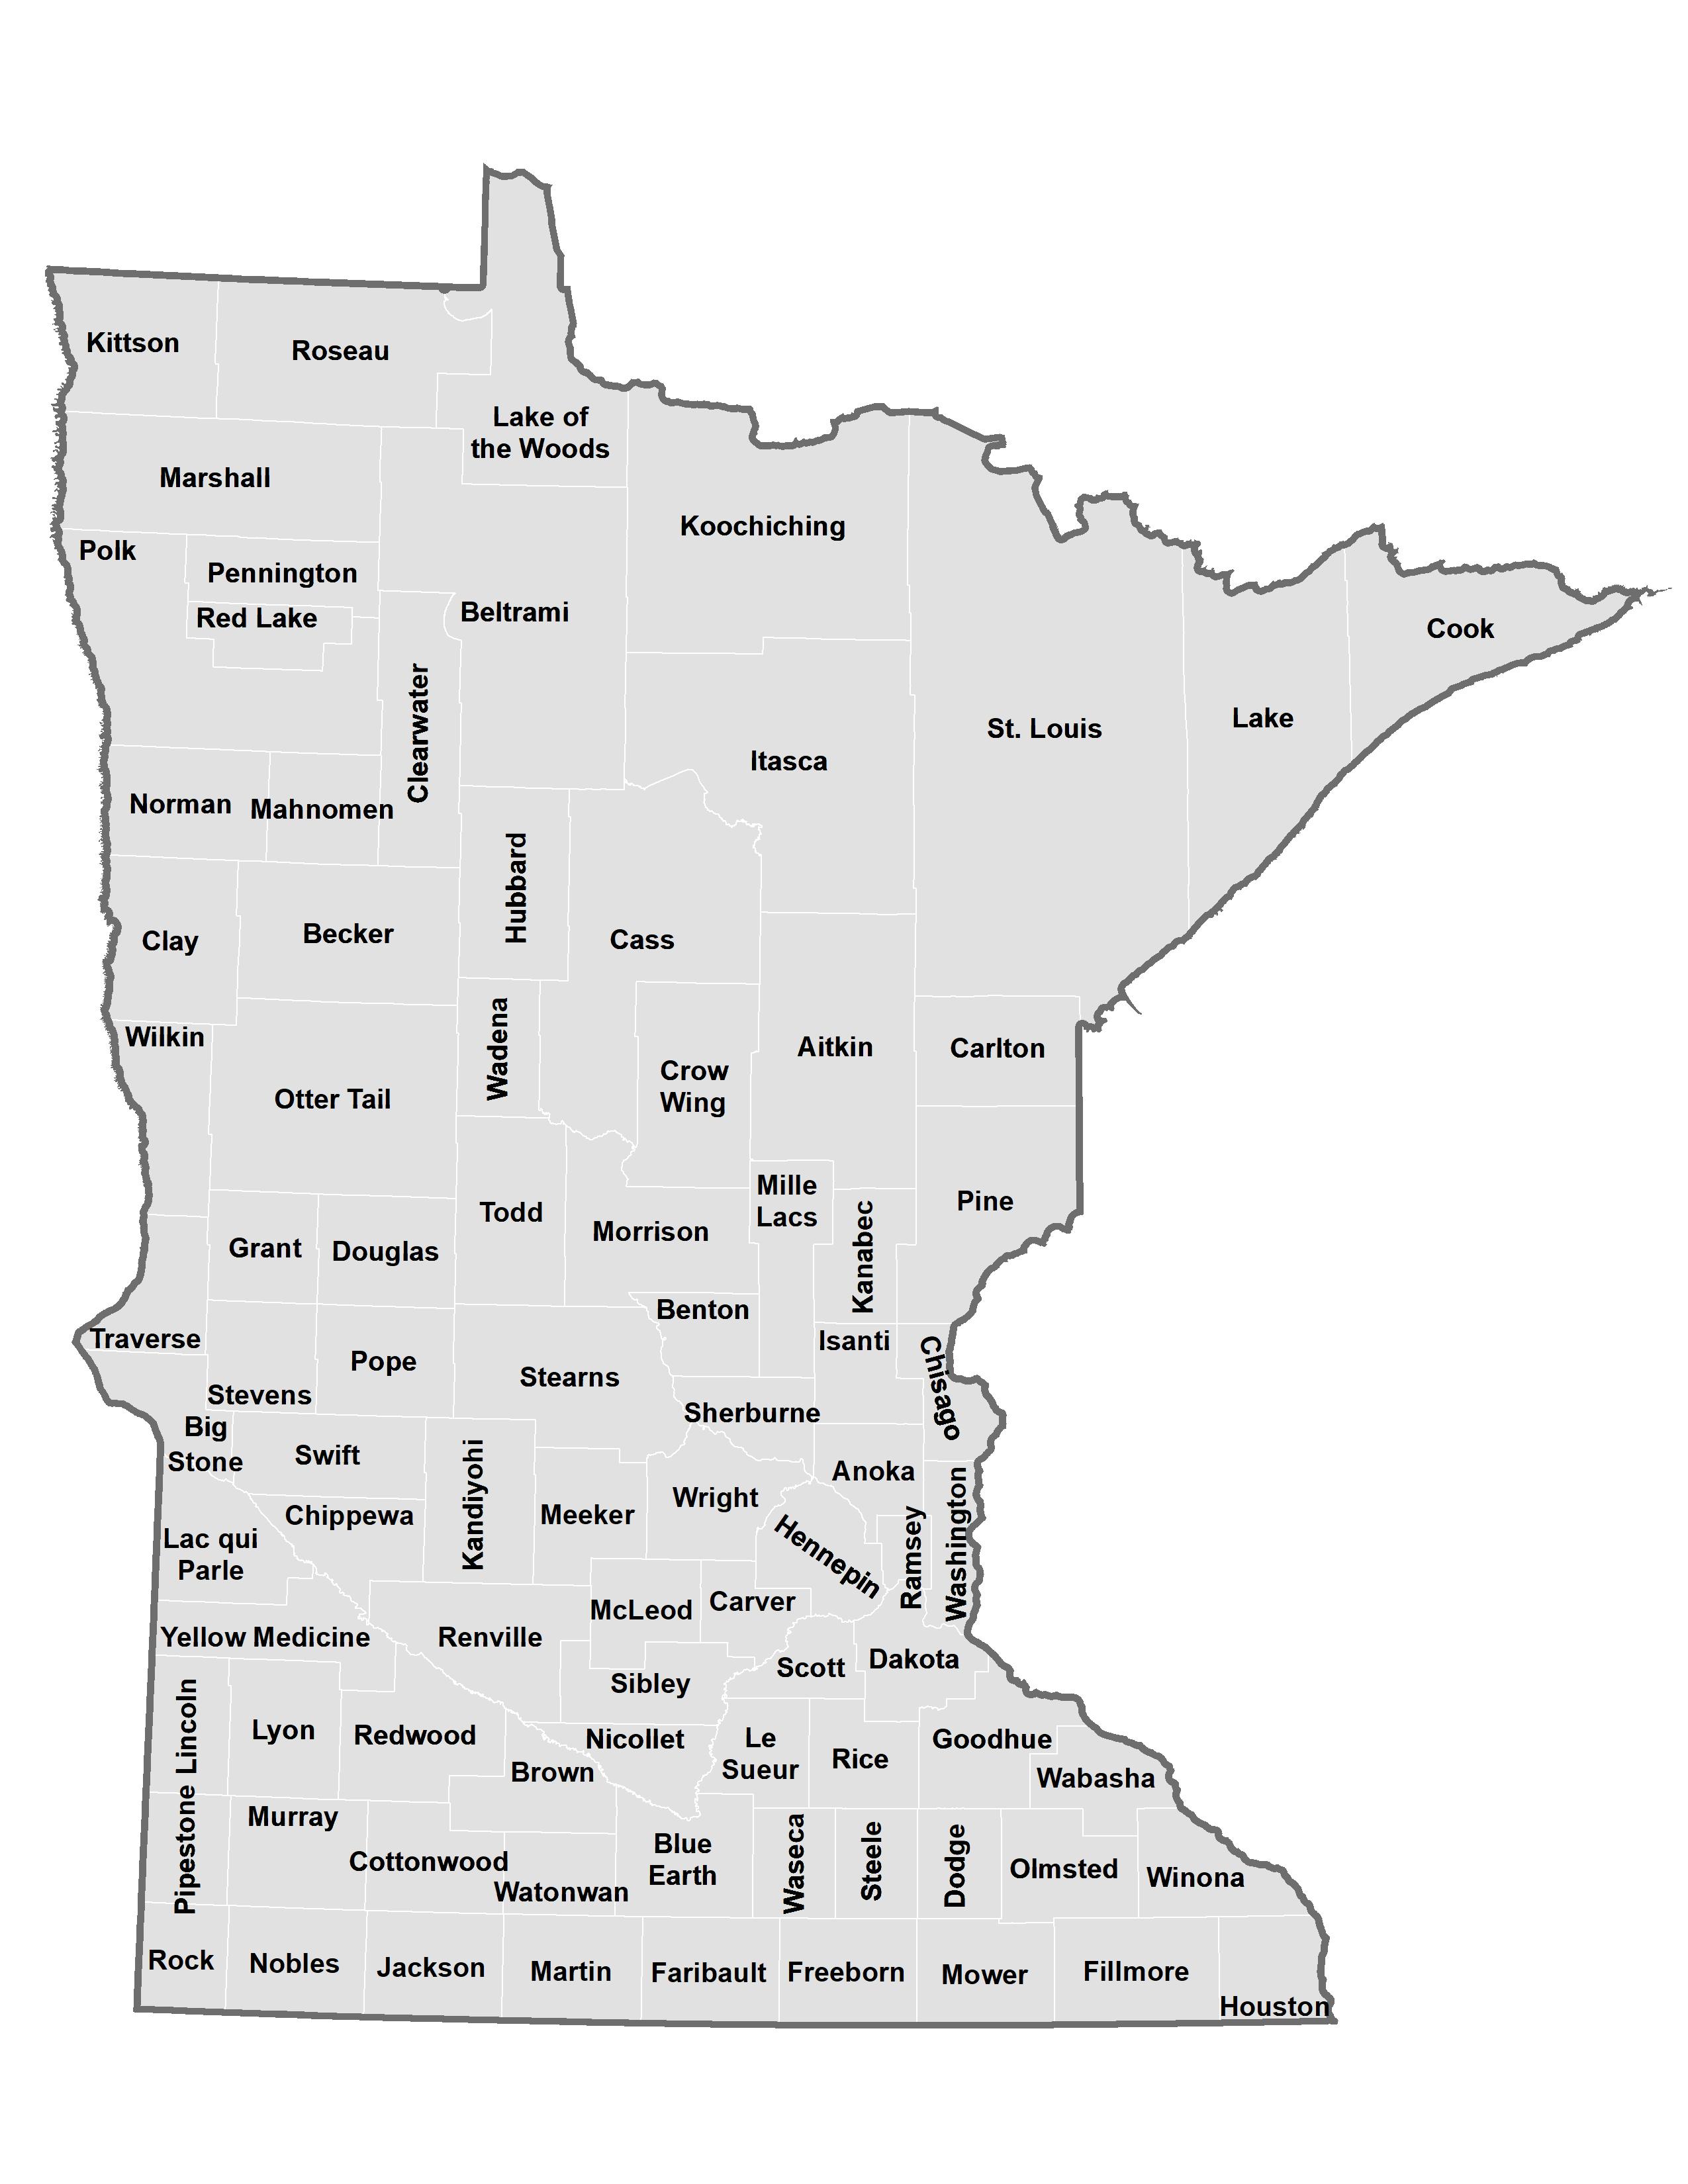 Minnesota counties